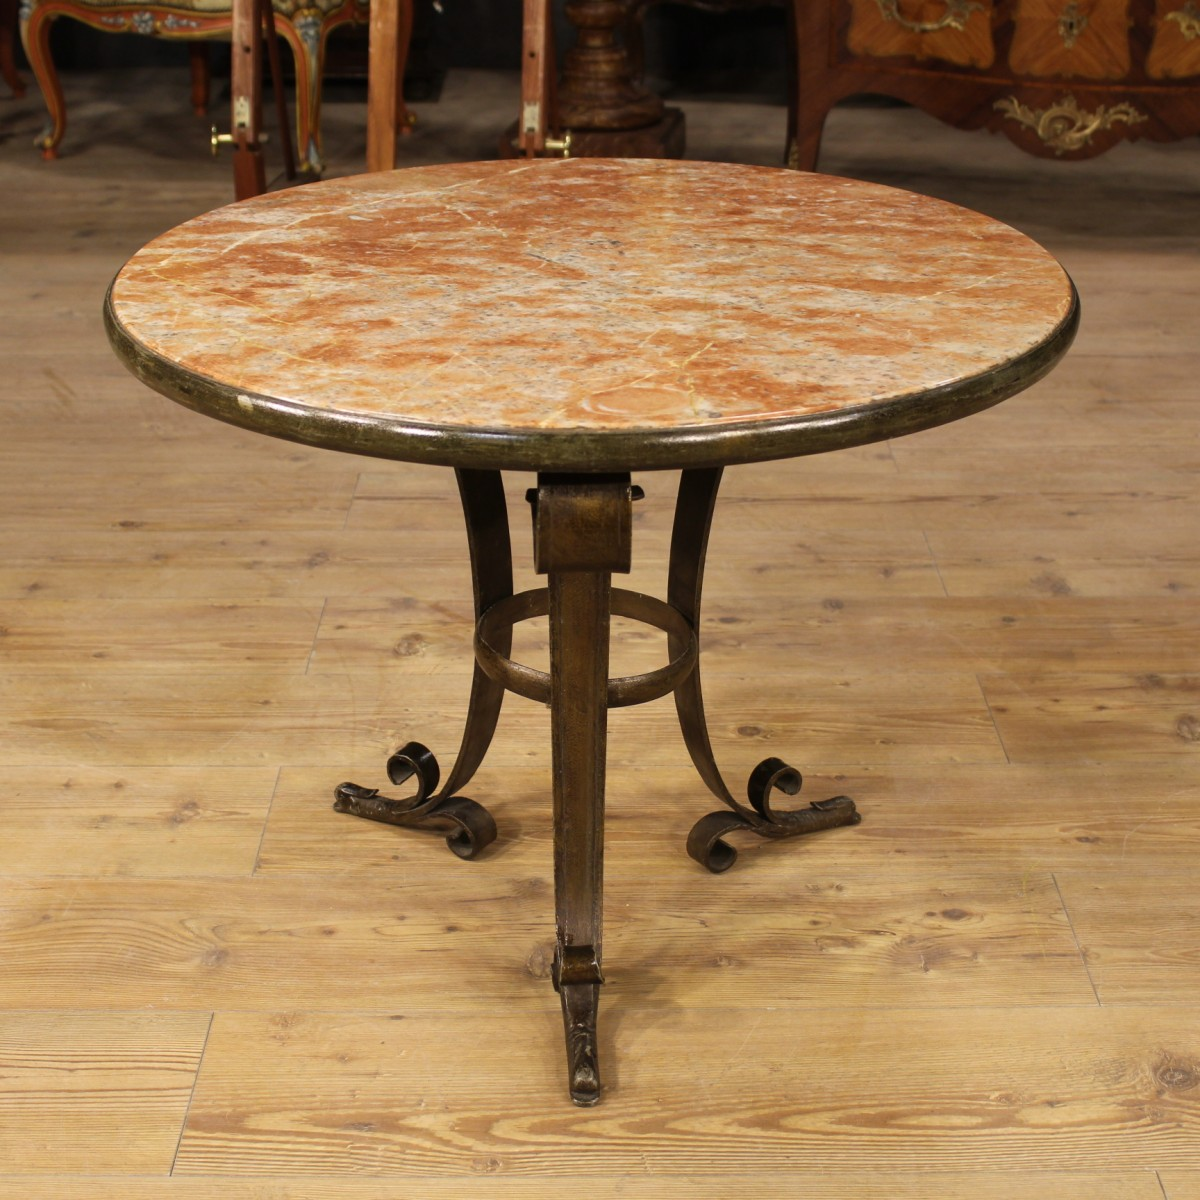 table basse italien salon meuble marbre art d co style. Black Bedroom Furniture Sets. Home Design Ideas